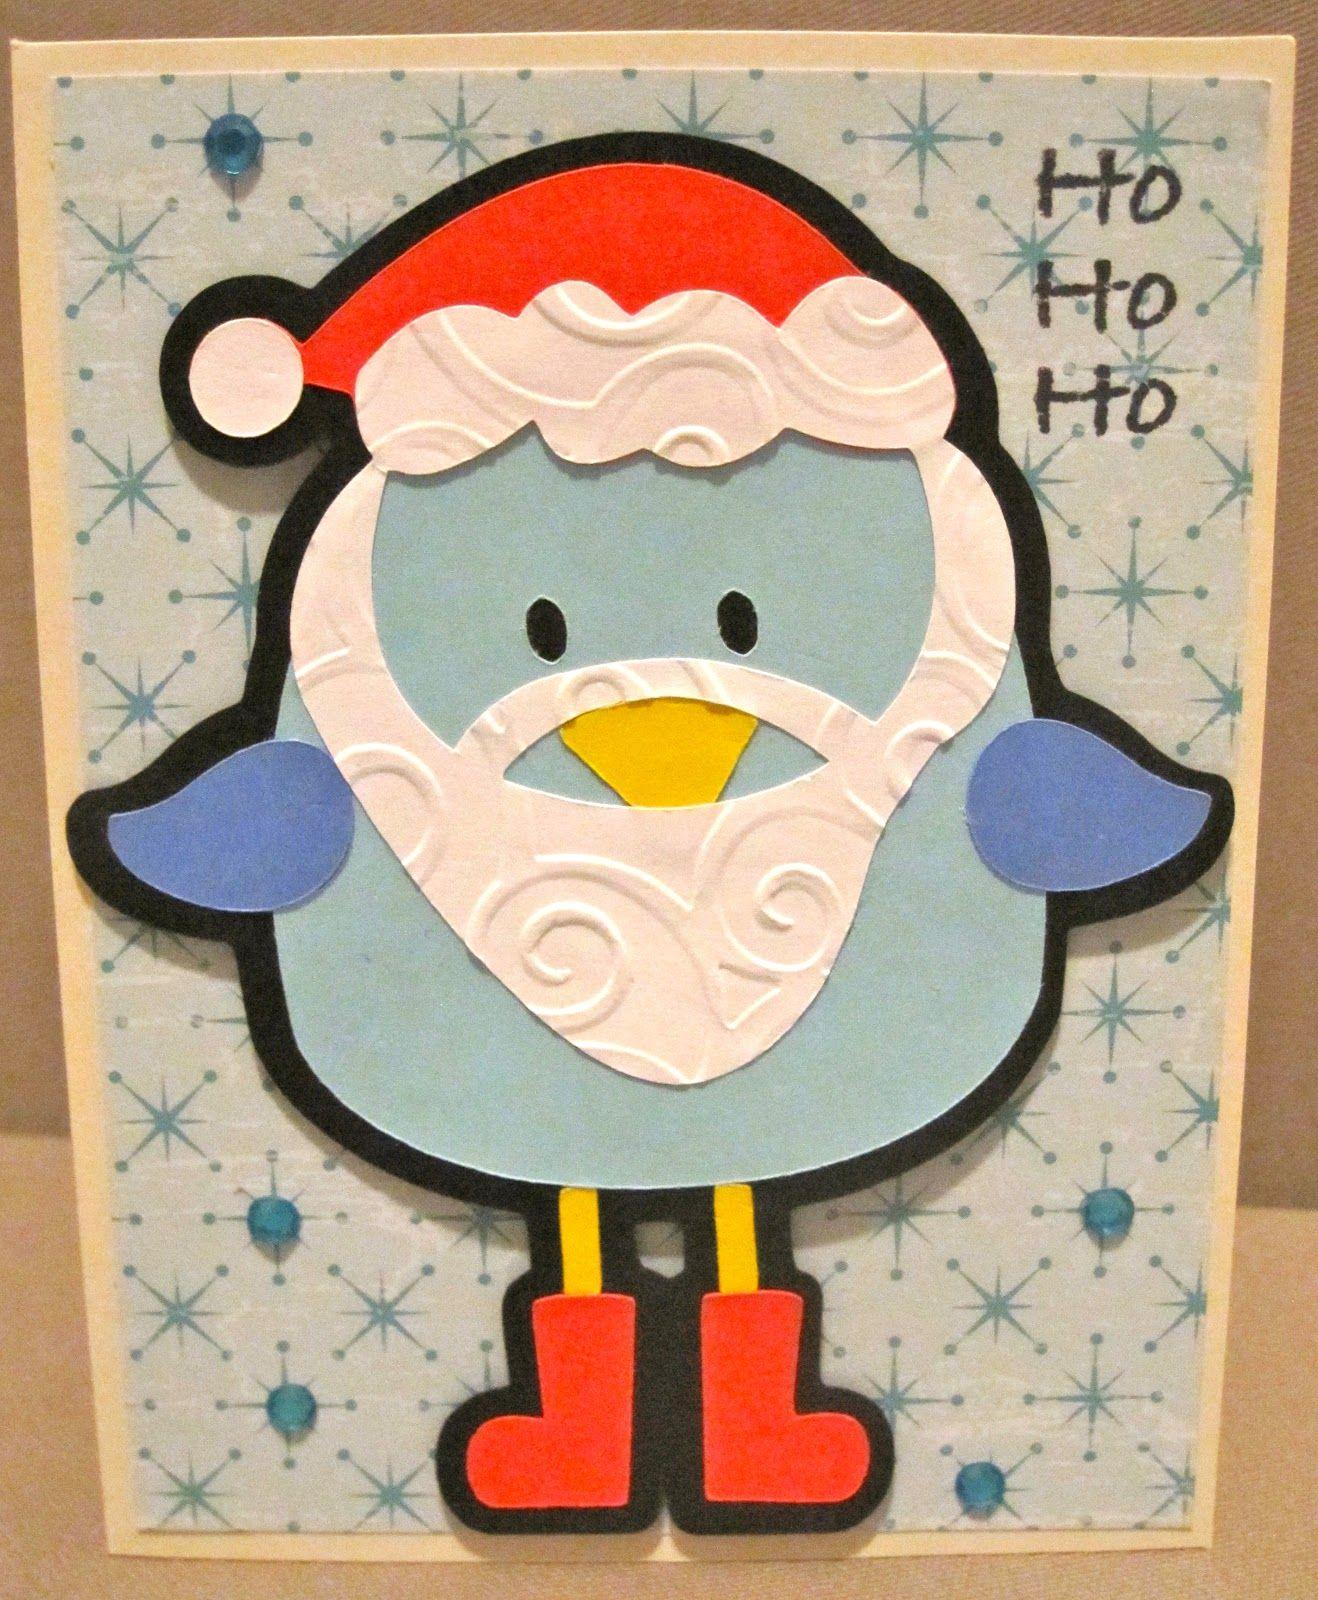 Scrapbook ideas using cricut - Christmas Card Using Cricut 3 Birds On Parade Cartridge Embossed With Cuttlebug